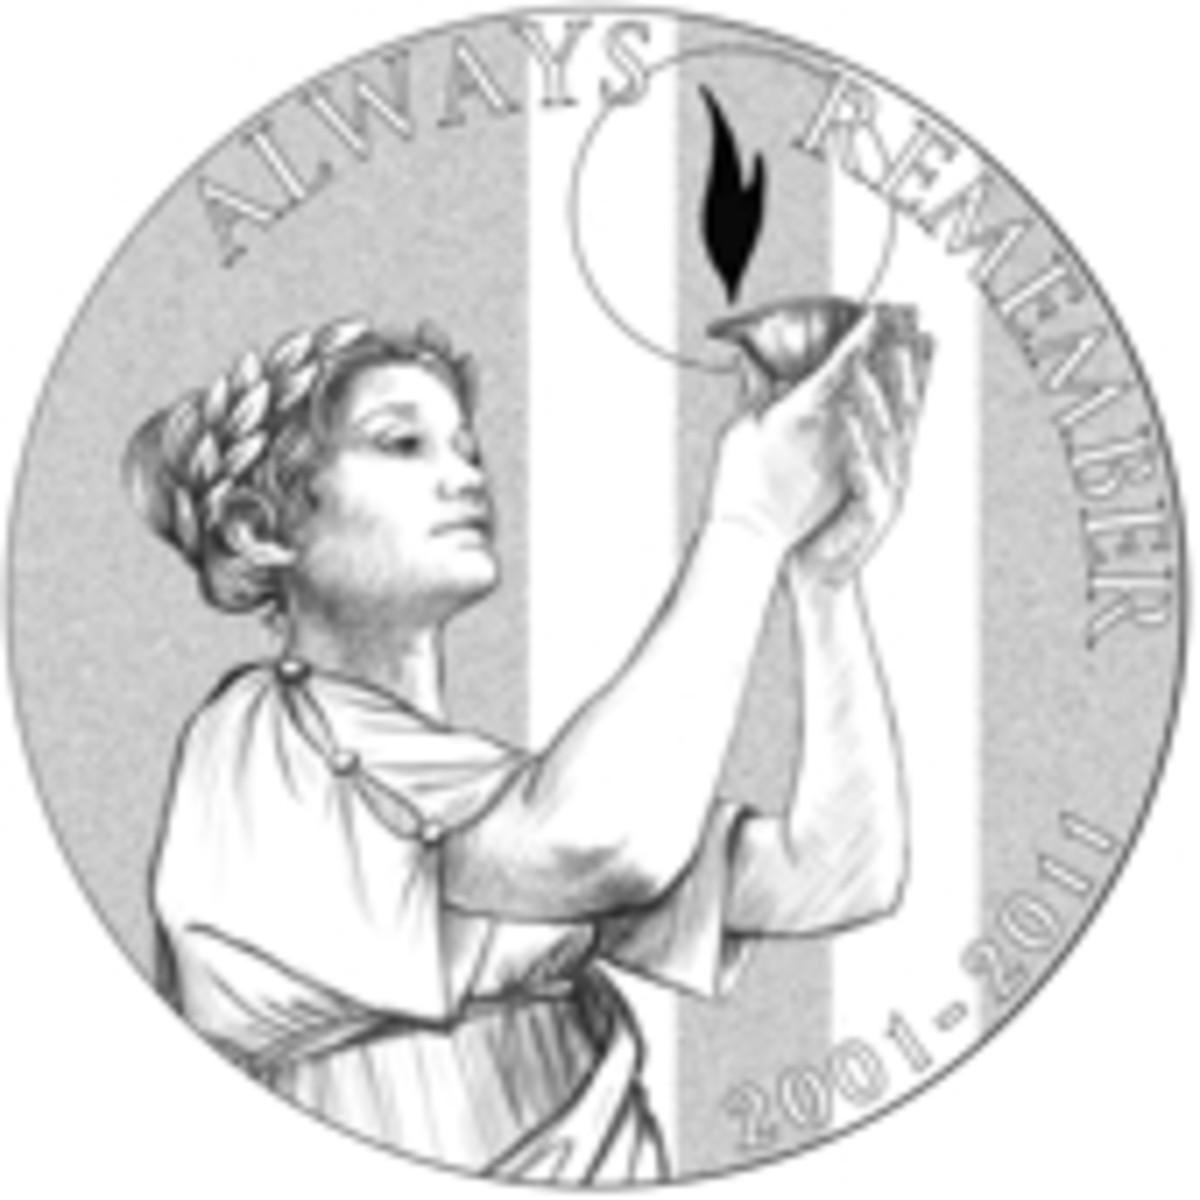 9/11 commemorative medal